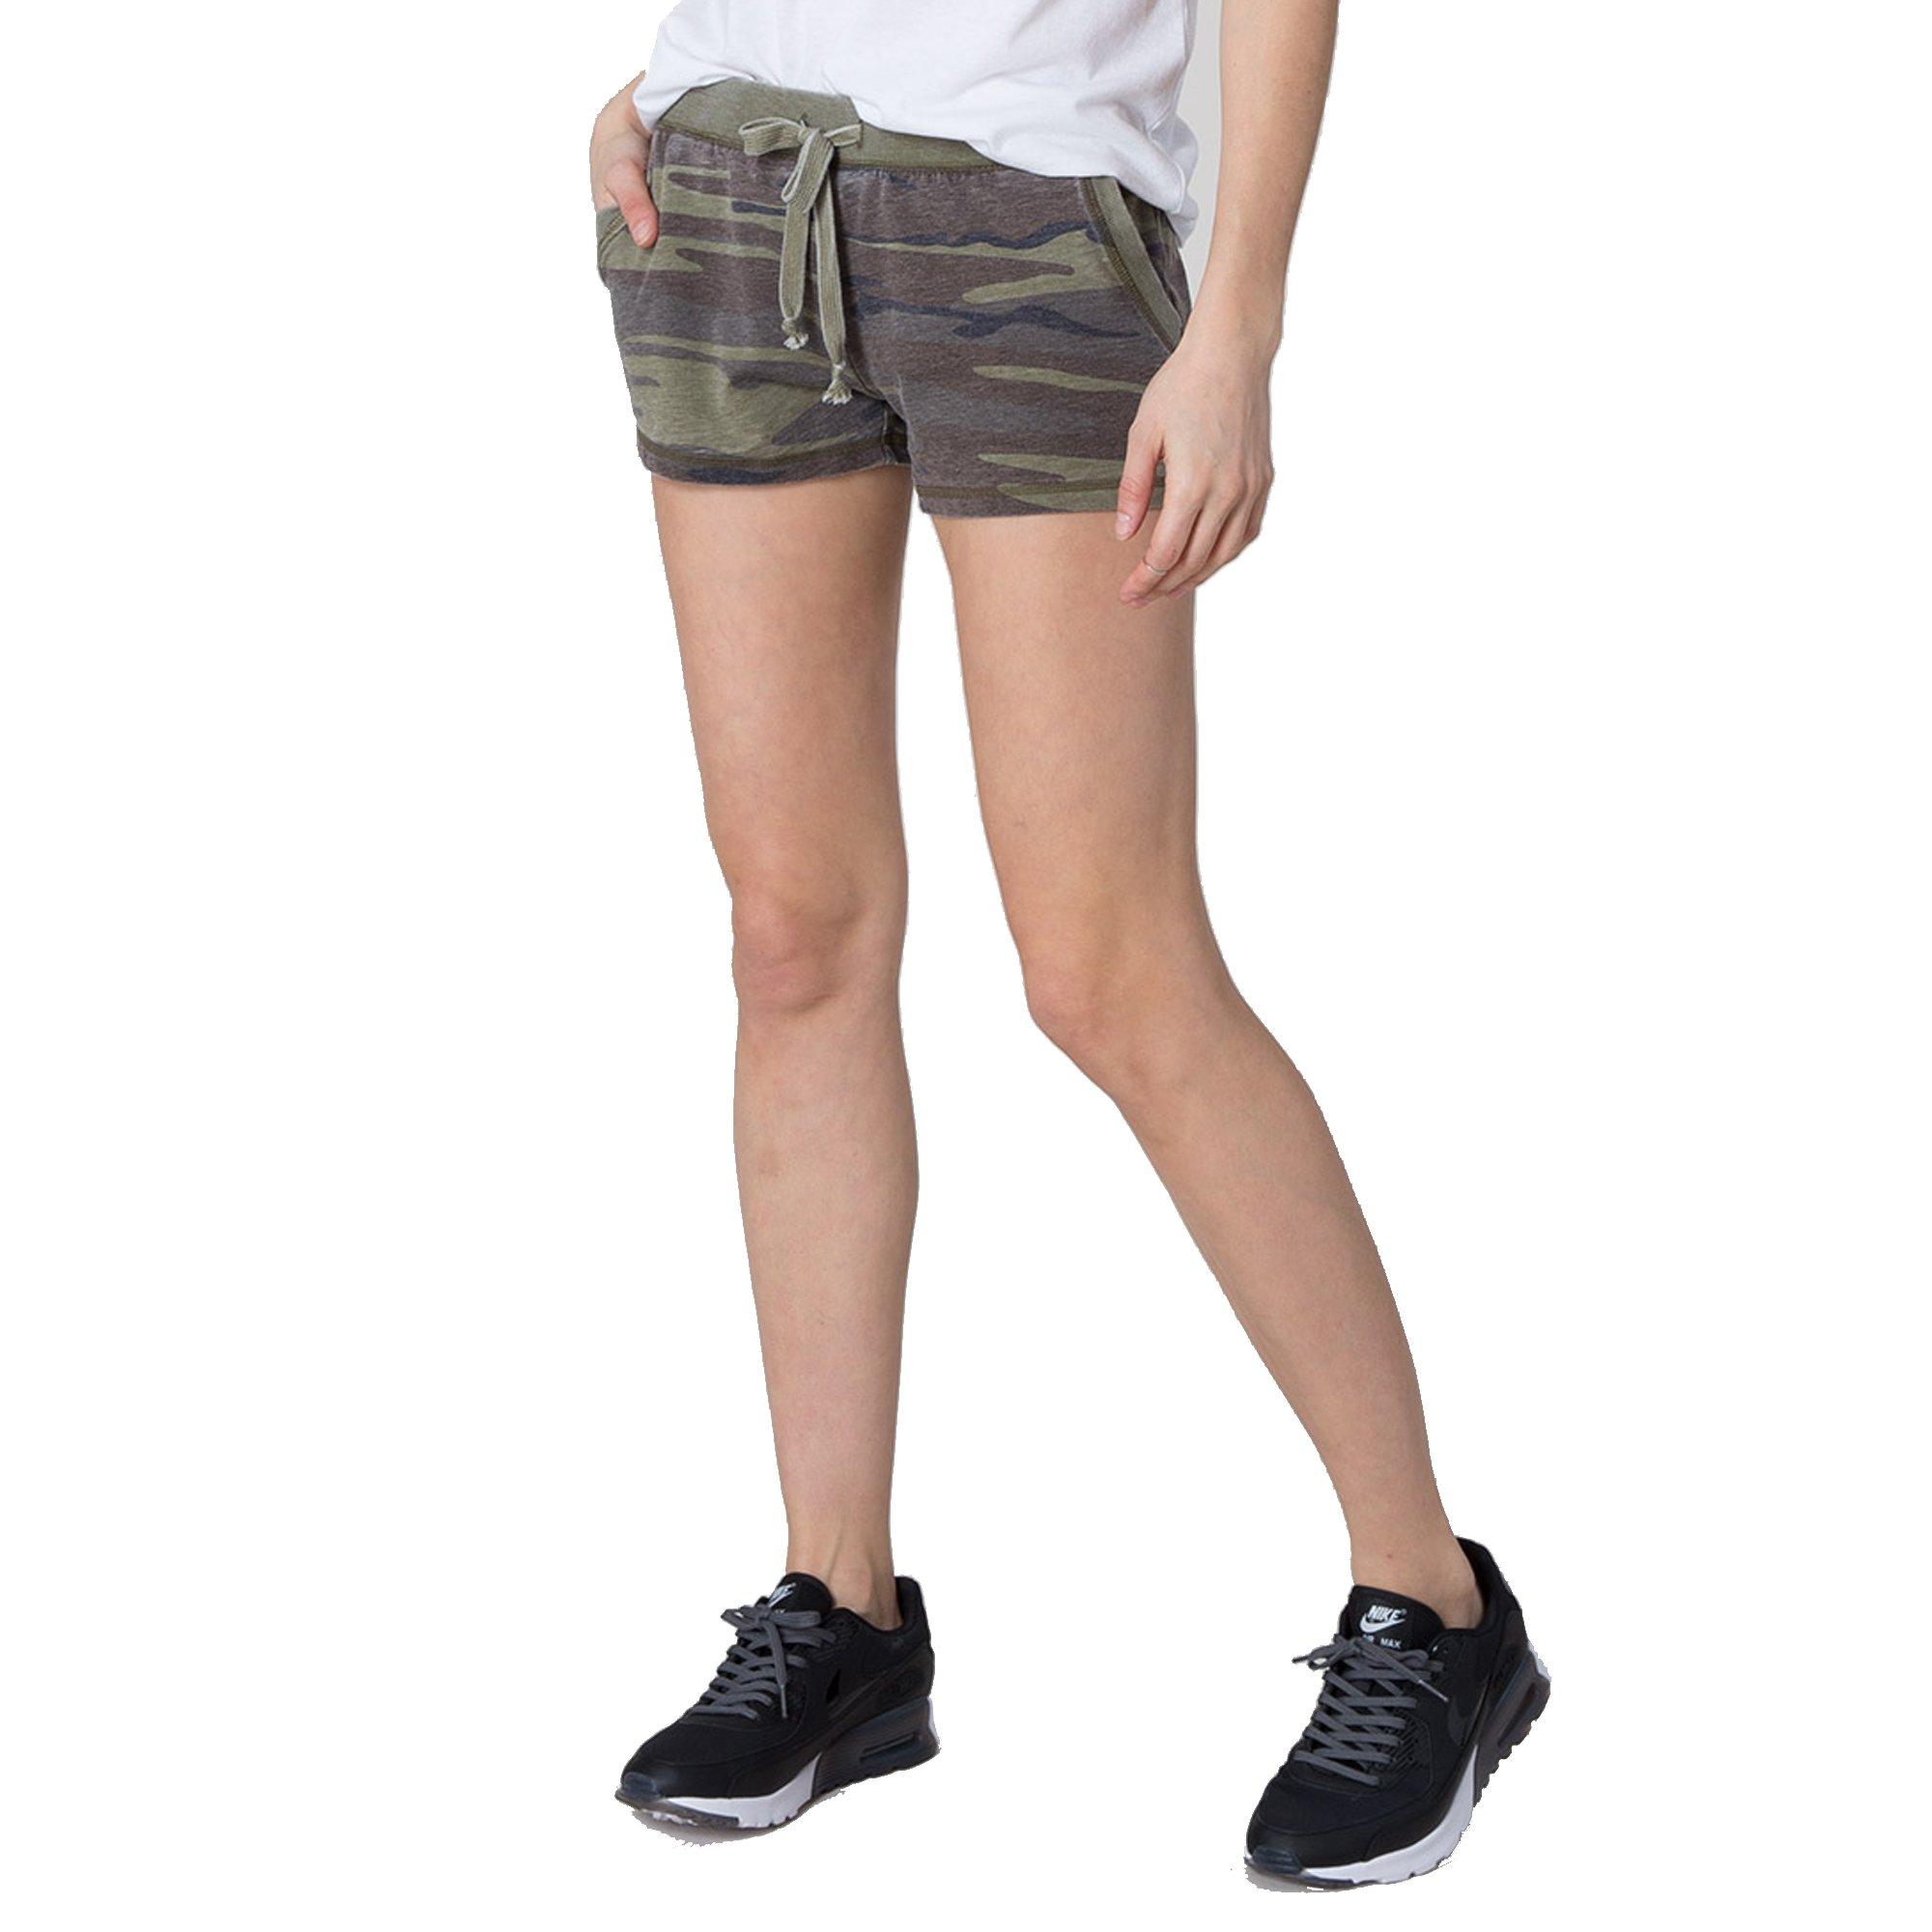 Z SUPPLY Women's The Camo Short, Camo Green, Large